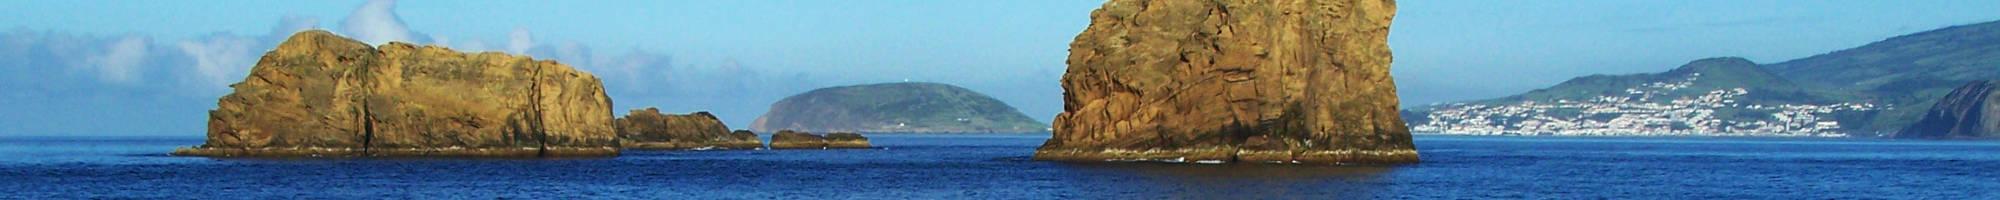 Felseninseln auf den Azoren